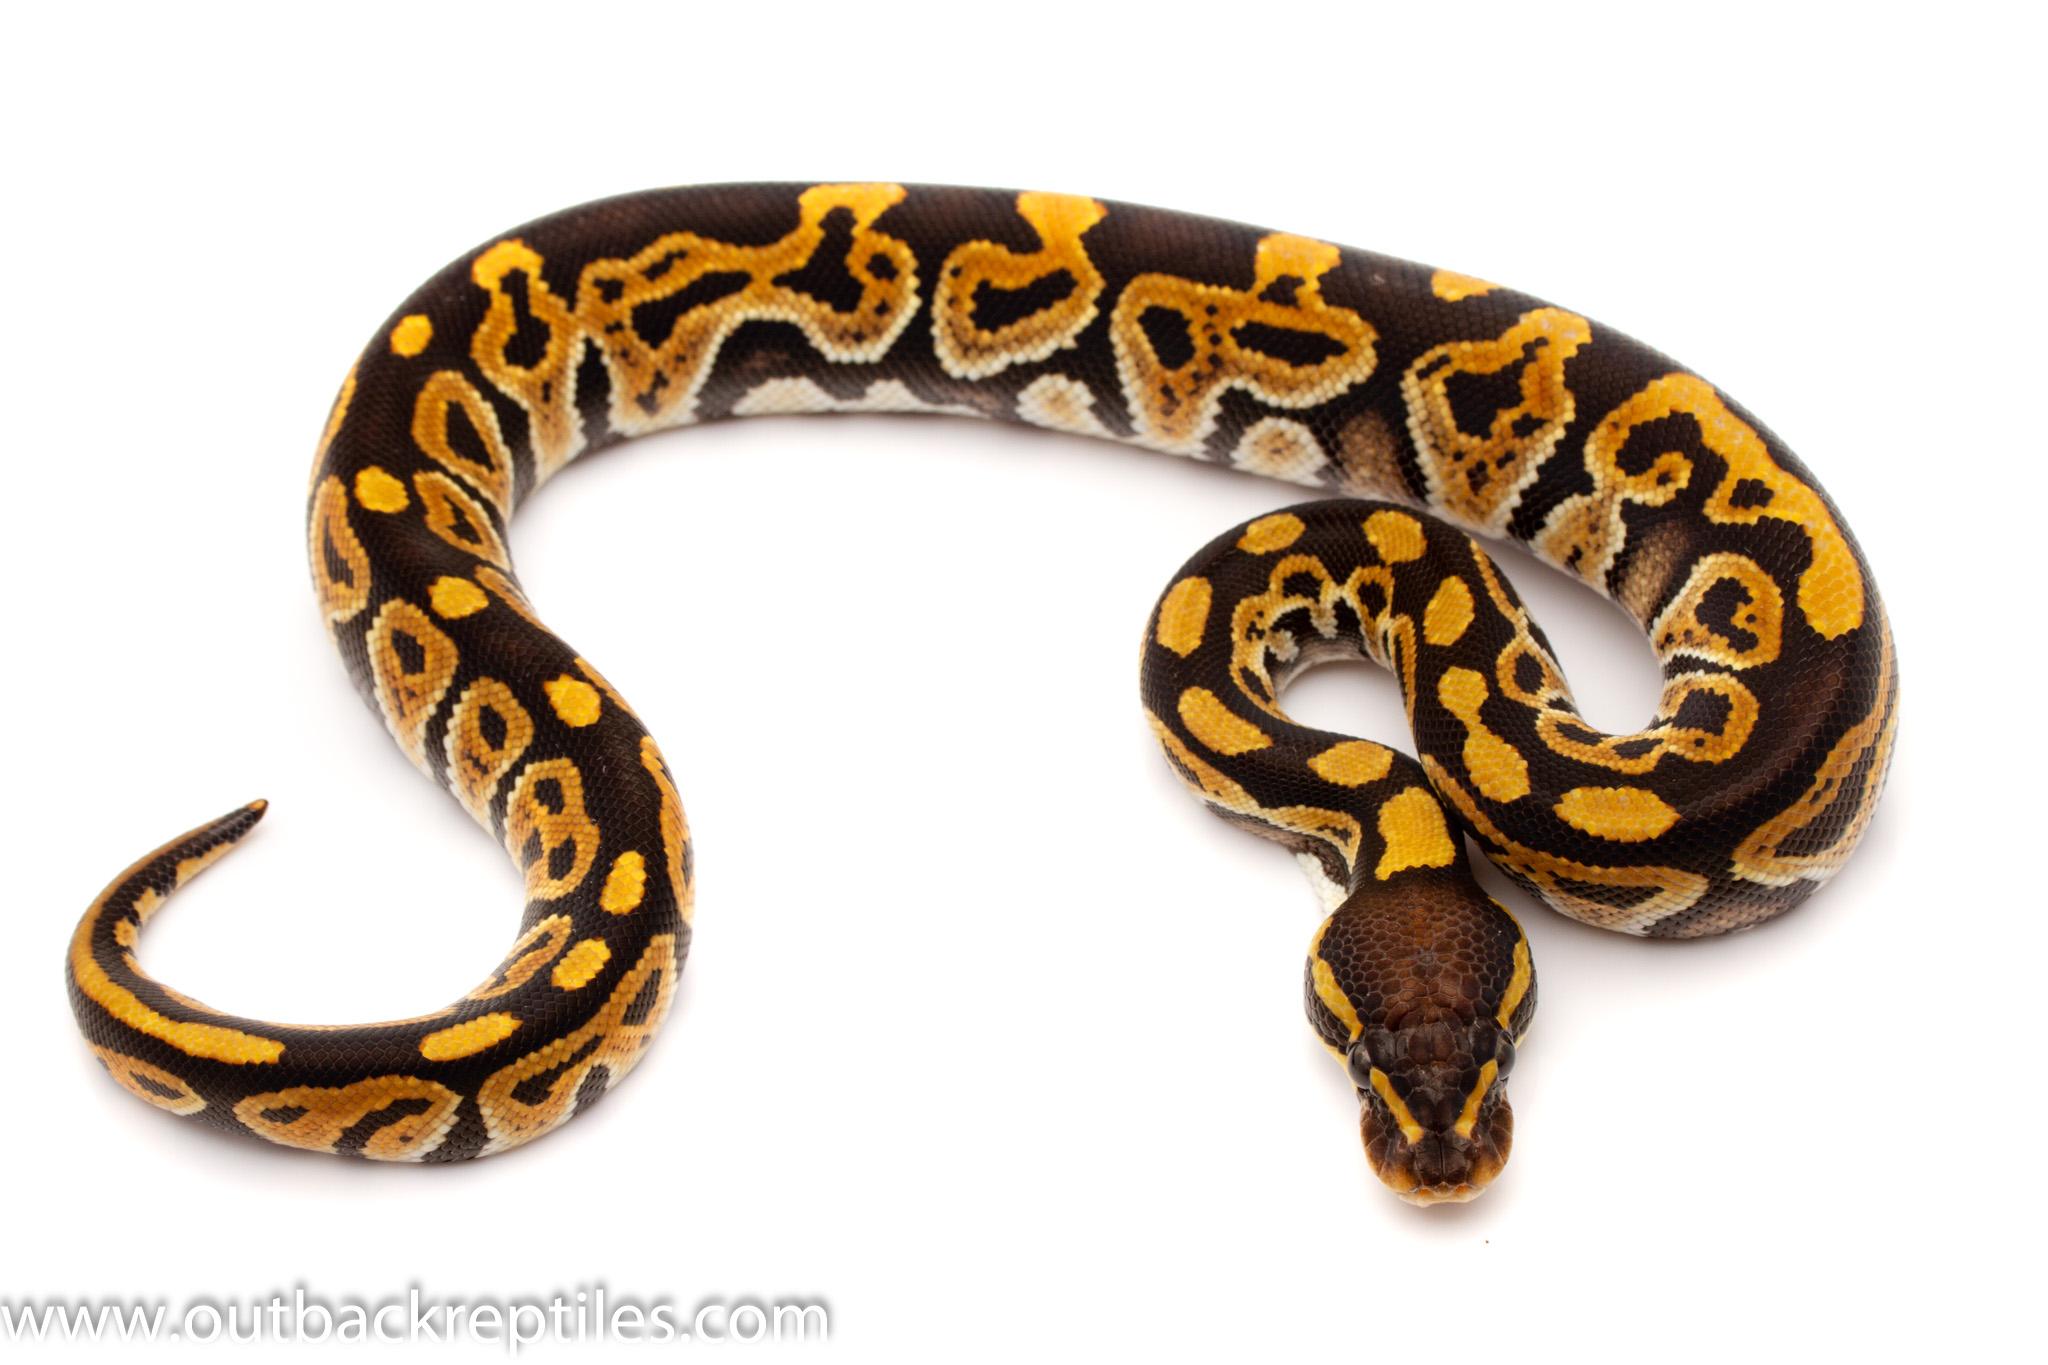 phantom ball python for sale